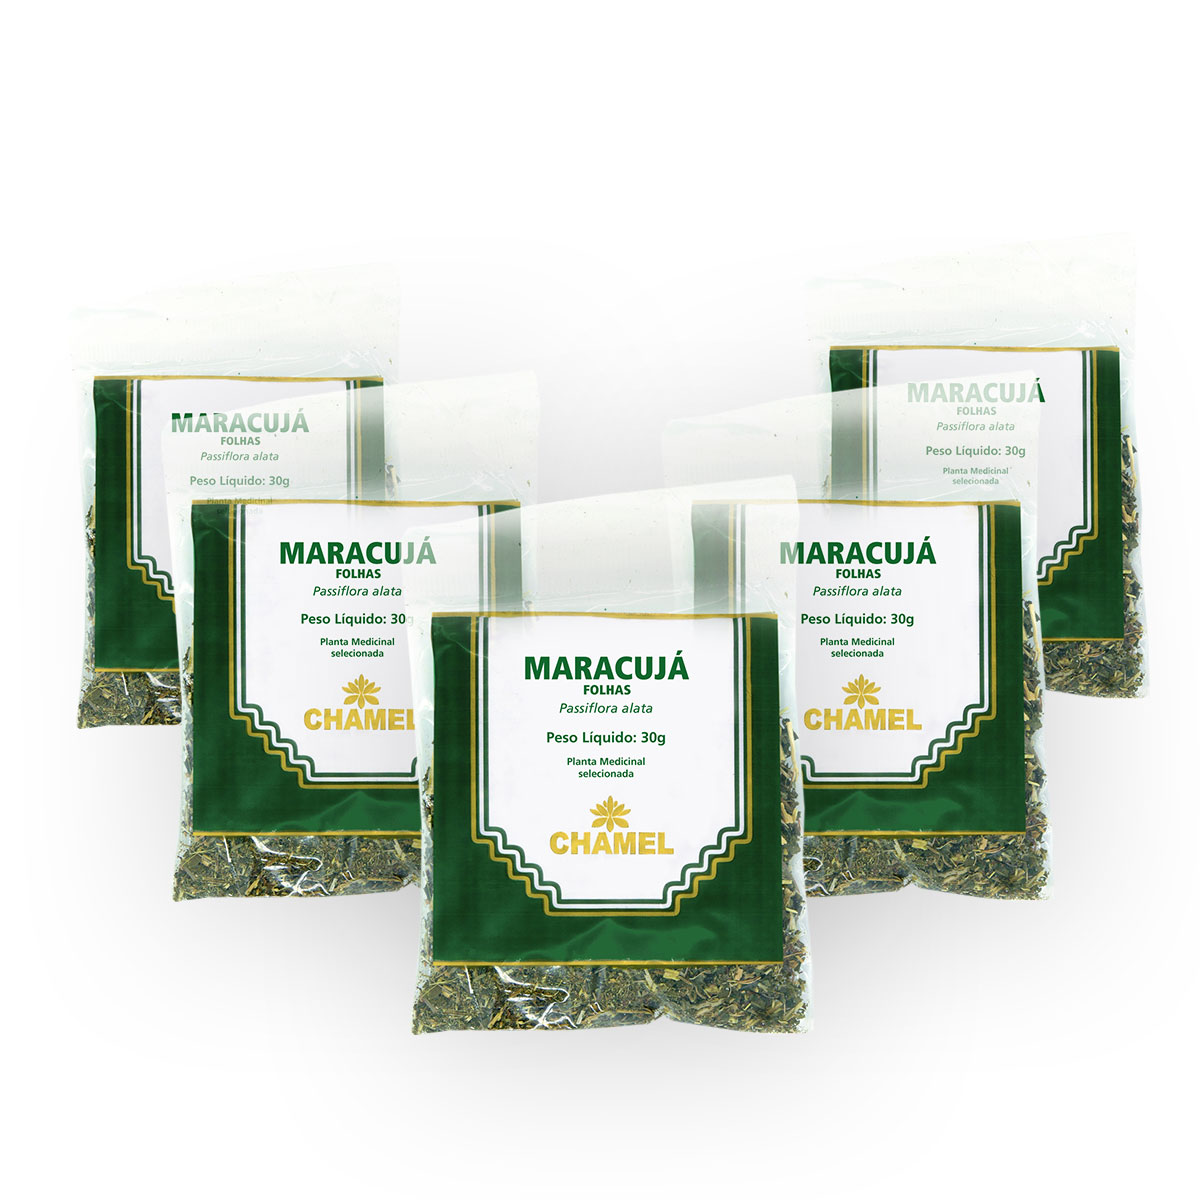 Maracujá 30g Chamel com 5 Unidades - Chá-Folhas